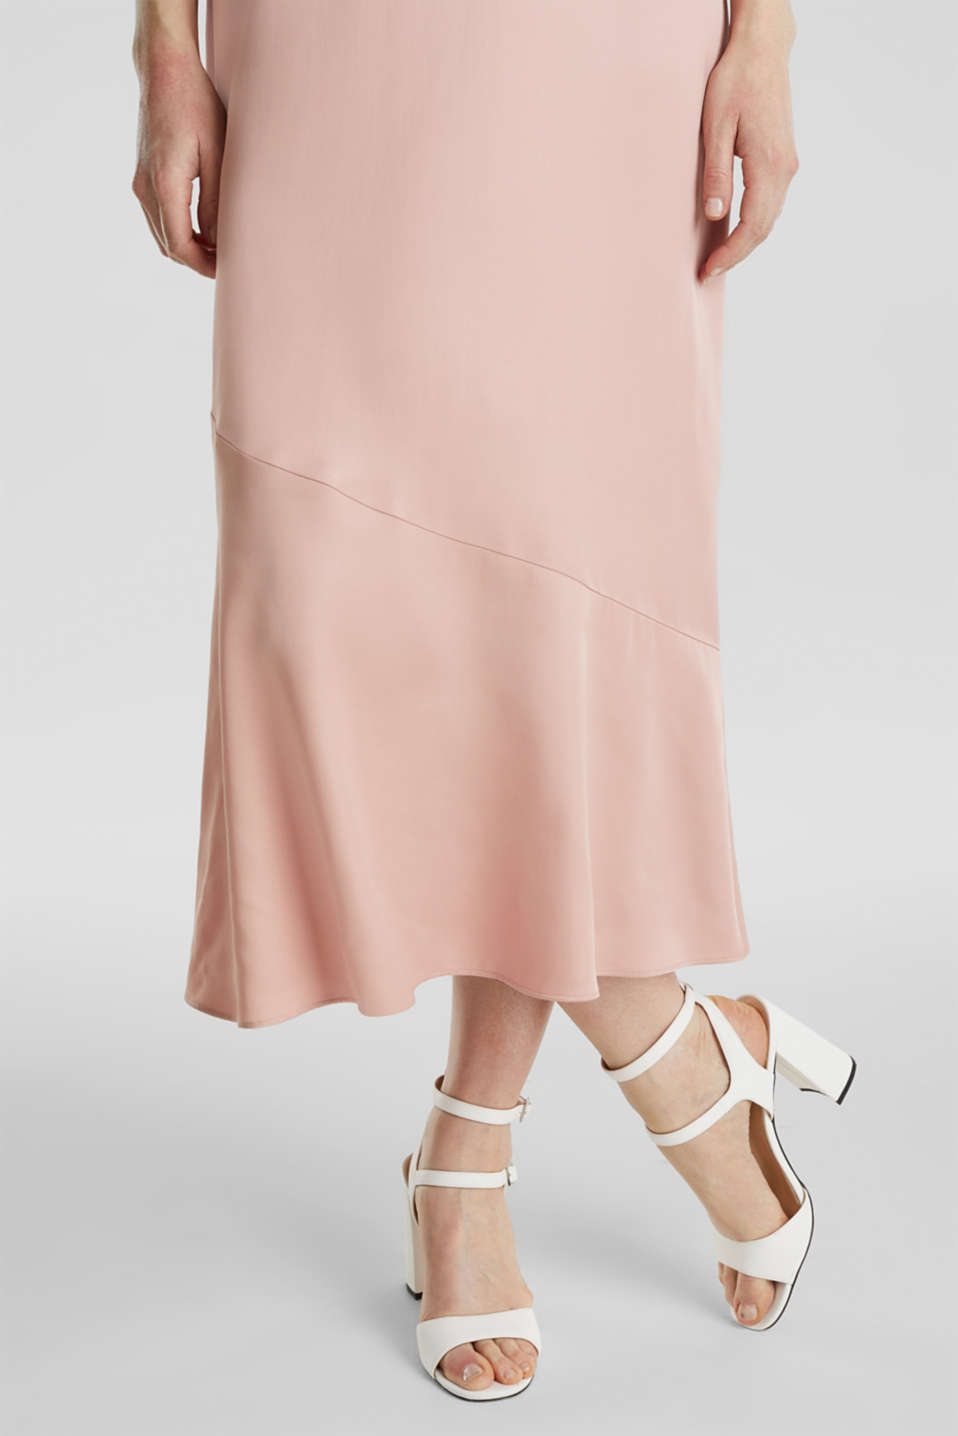 Satin dress with a flounce hem, NUDE, detail image number 4